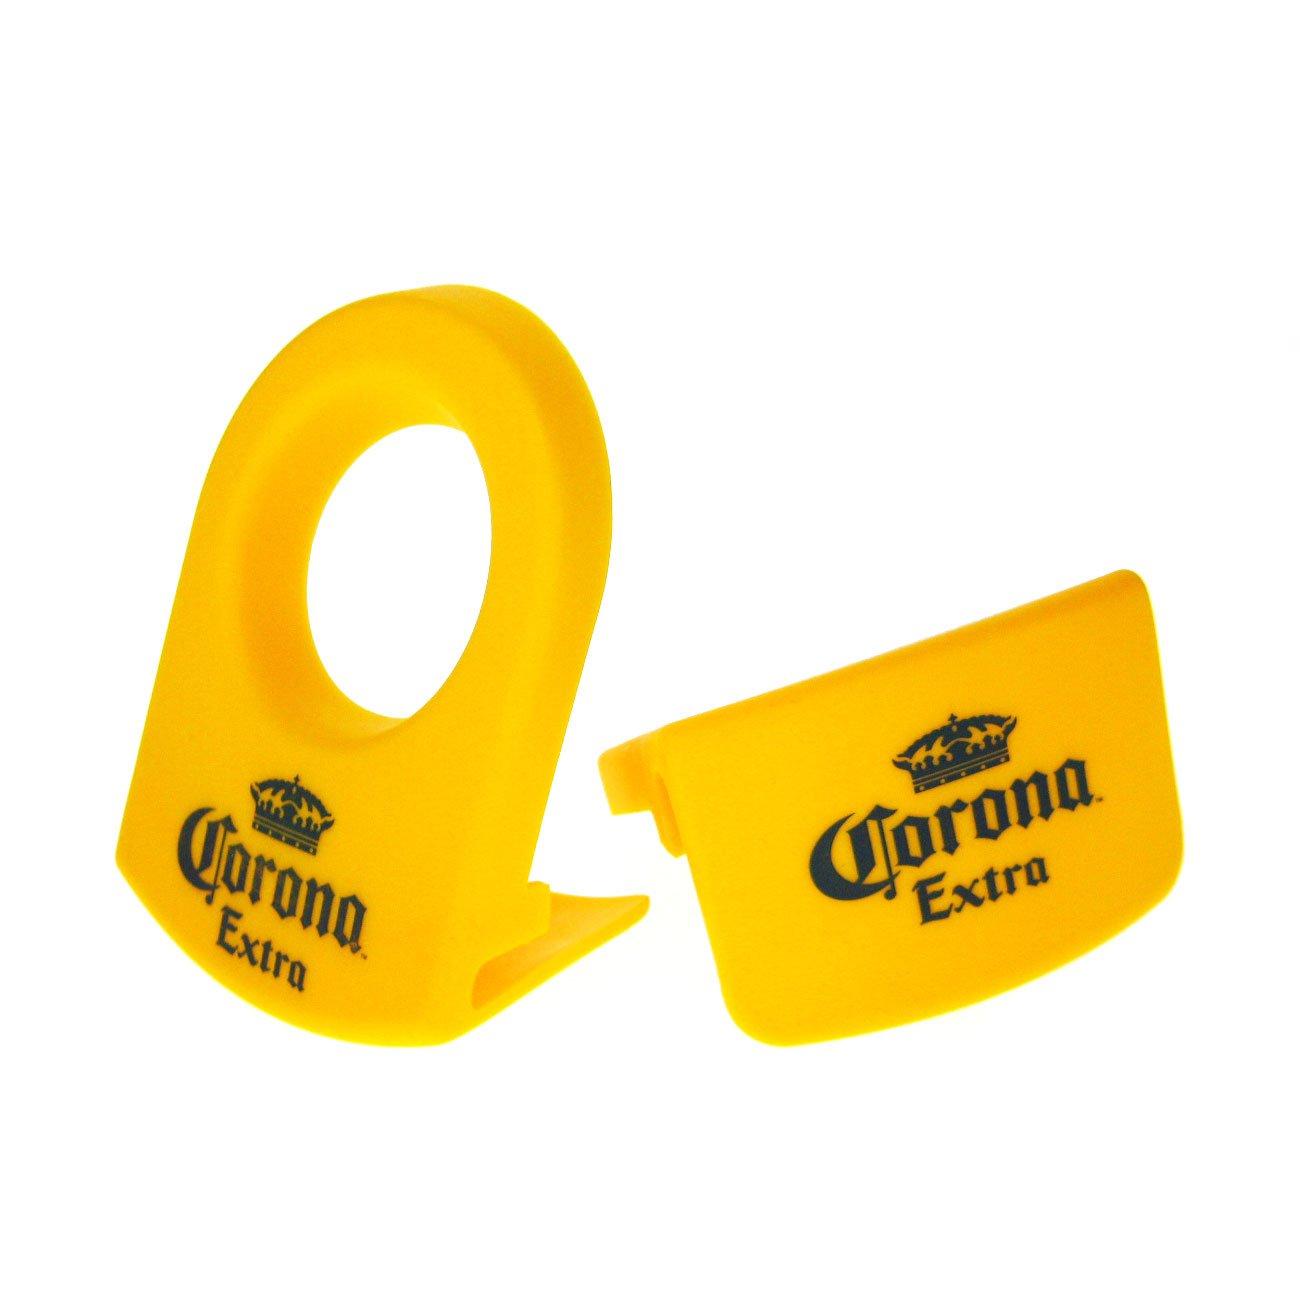 CoronaRita Yellow Drink Clips - For Margarita Glasses - Set of 8